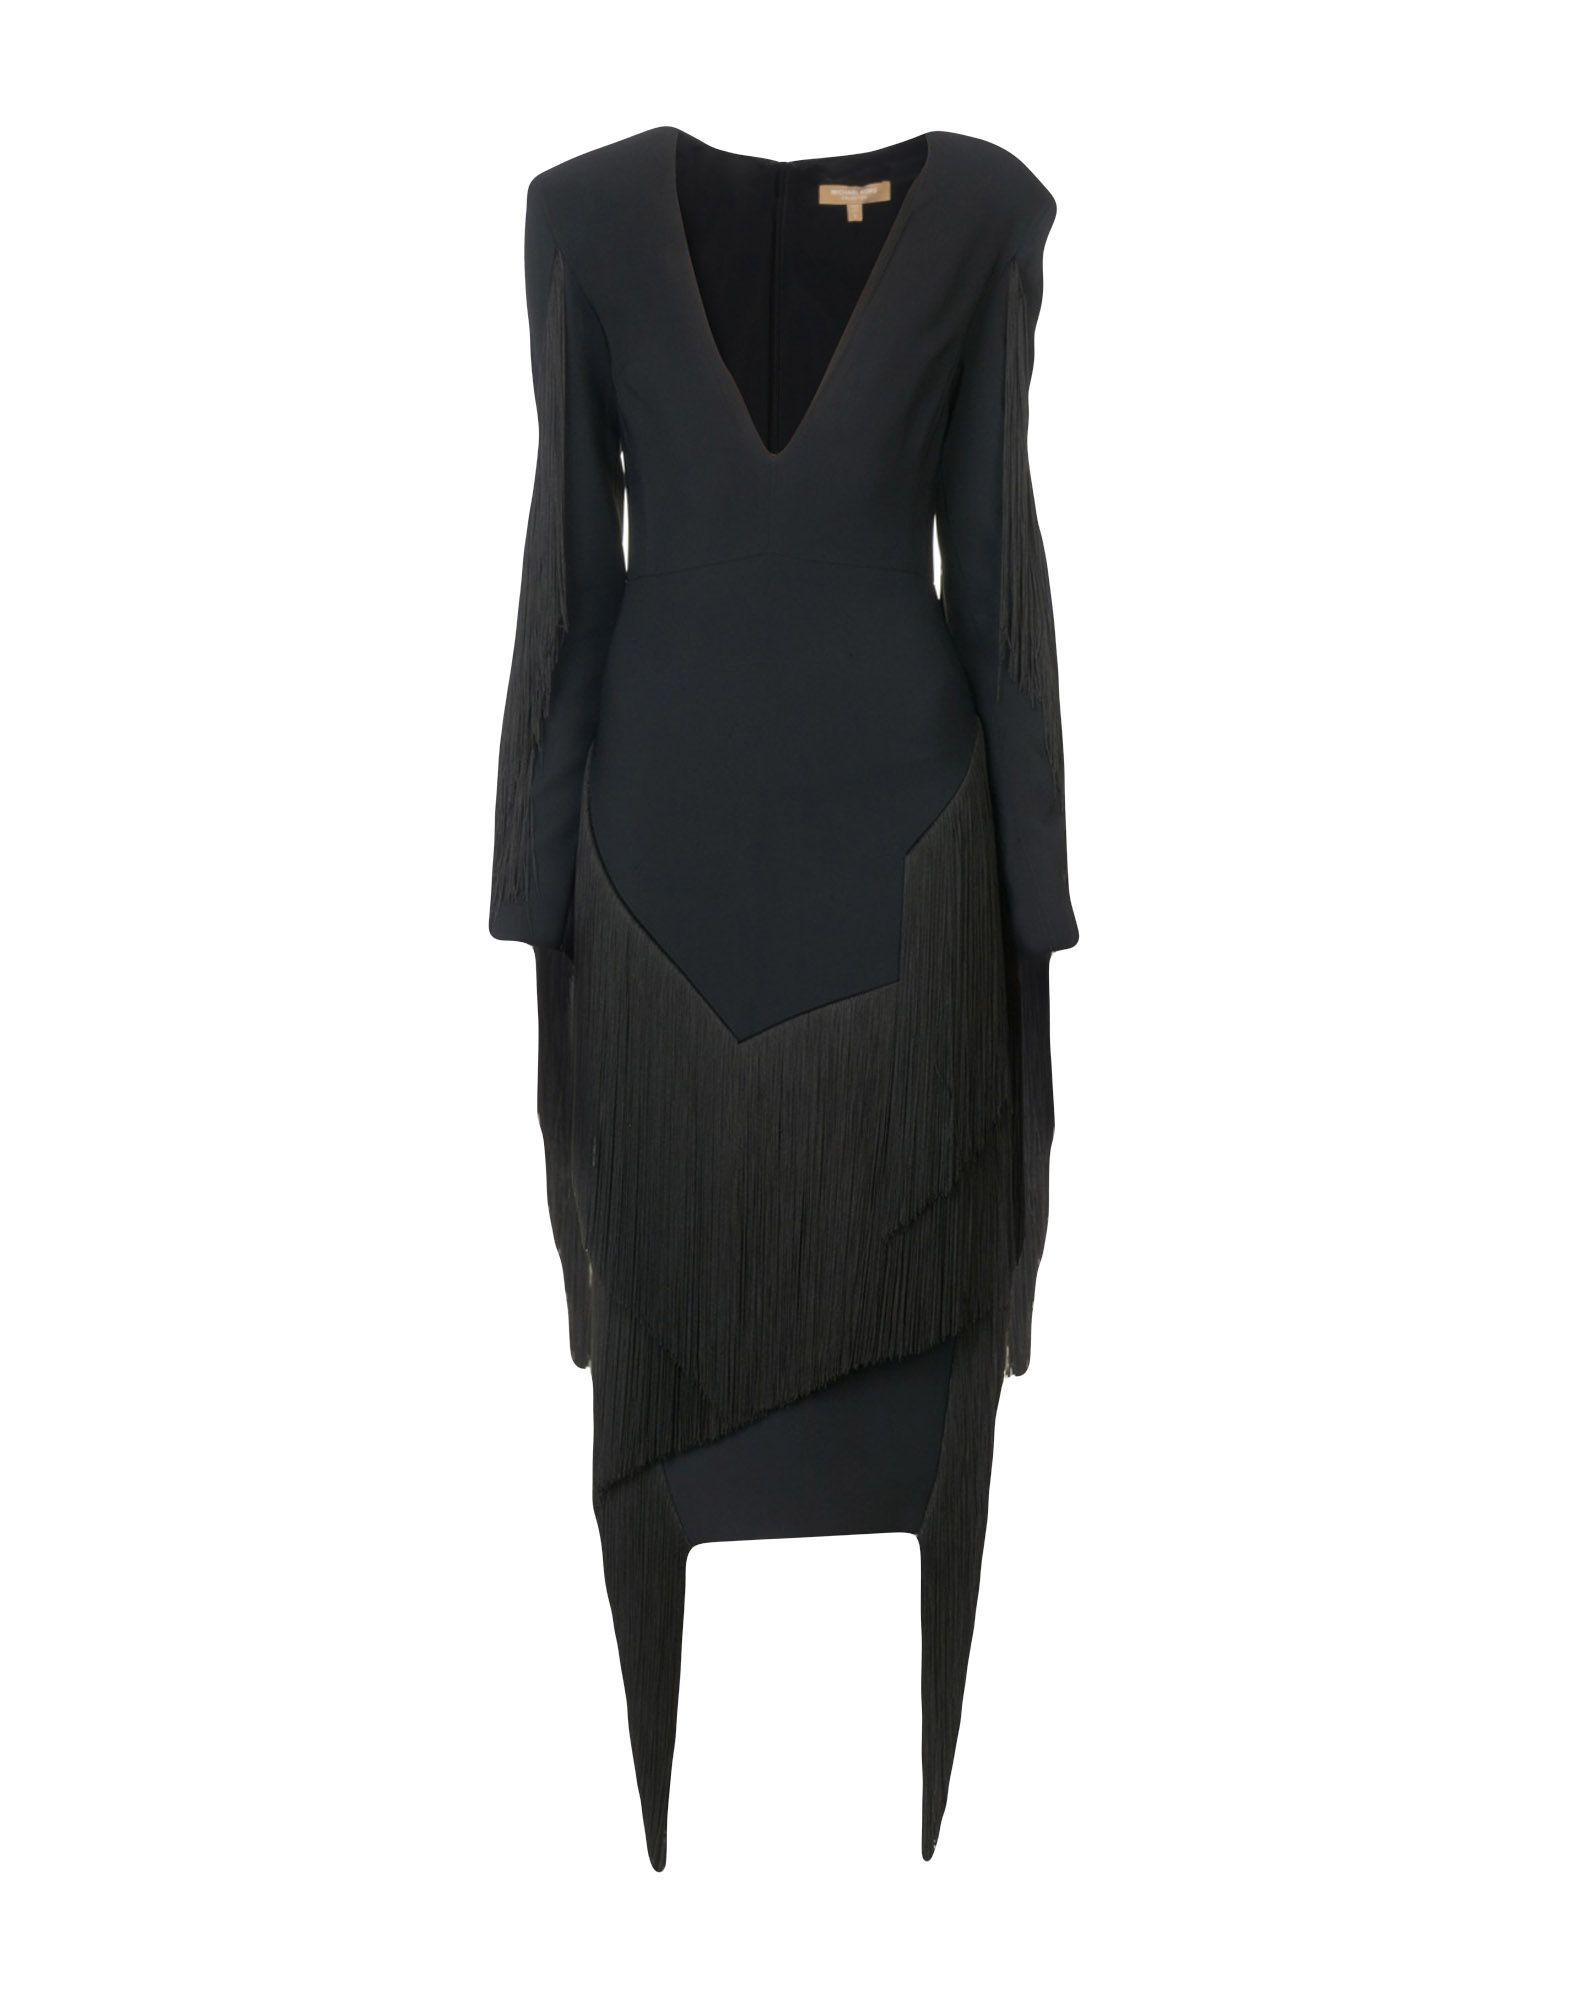 Michael Kors Midi Dress In Black